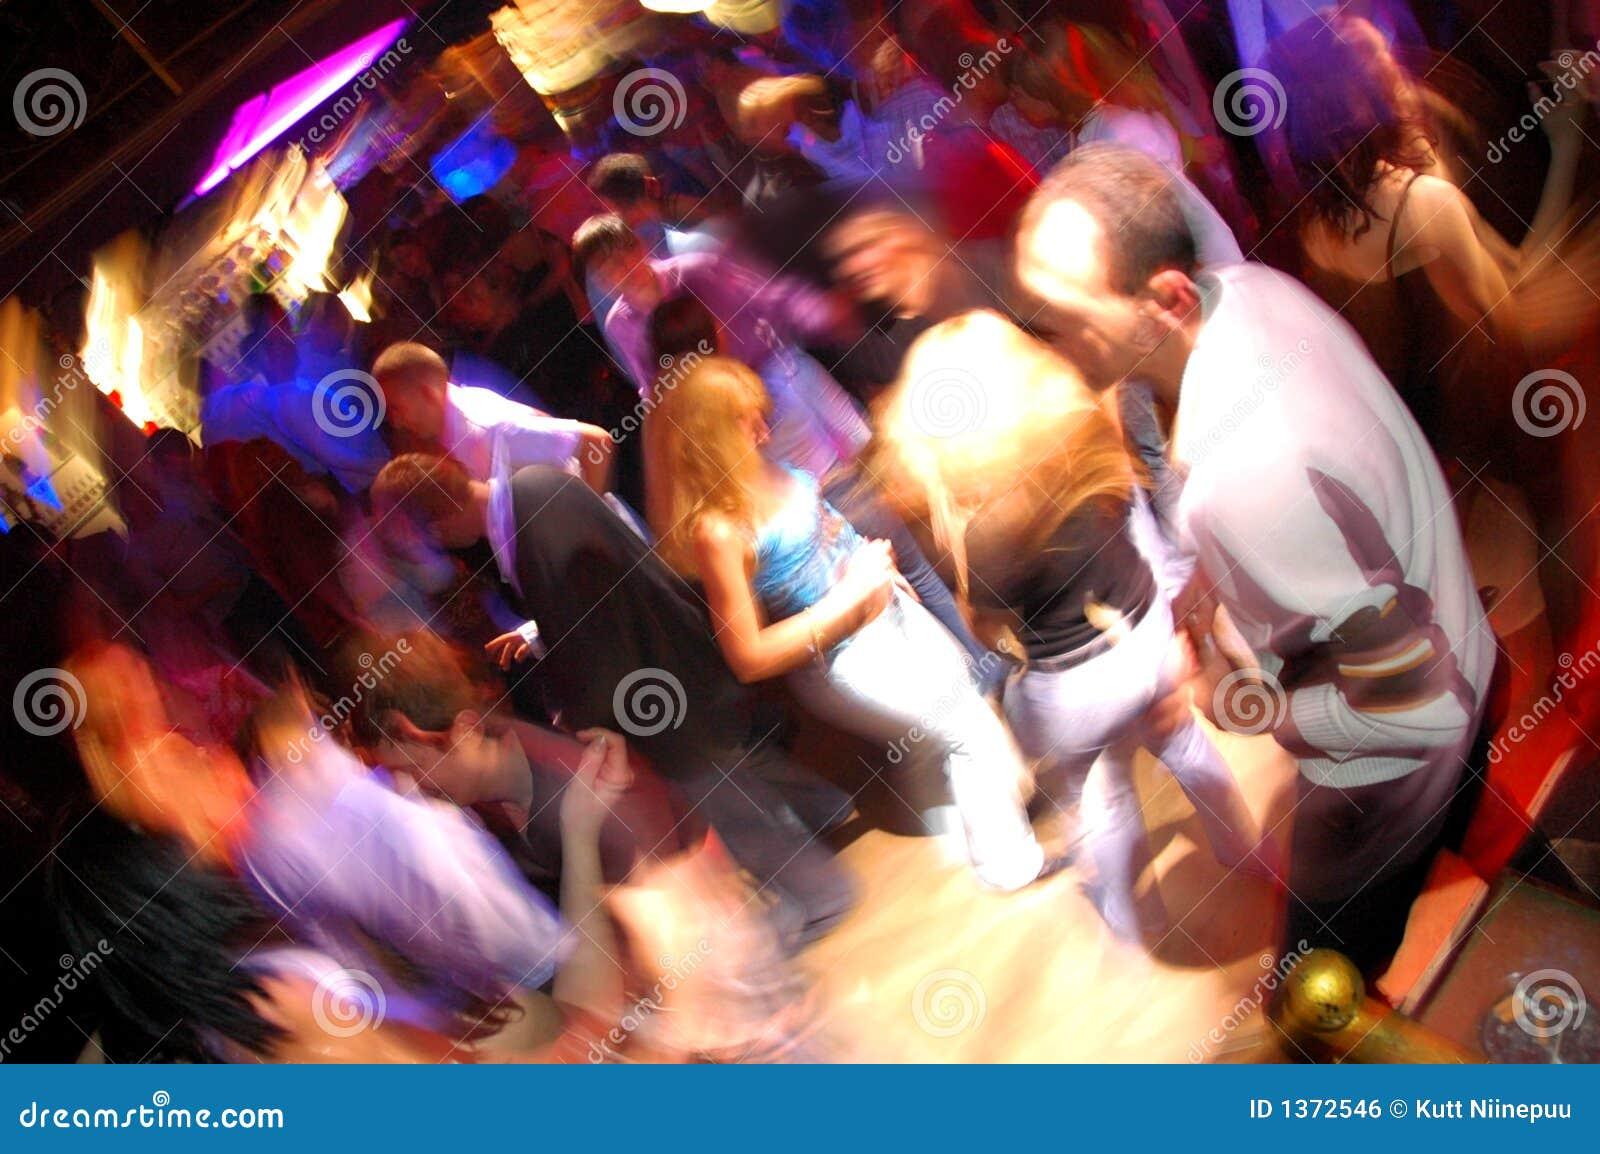 Disco night club dancing people stock photo image 1372546 for Disco night club